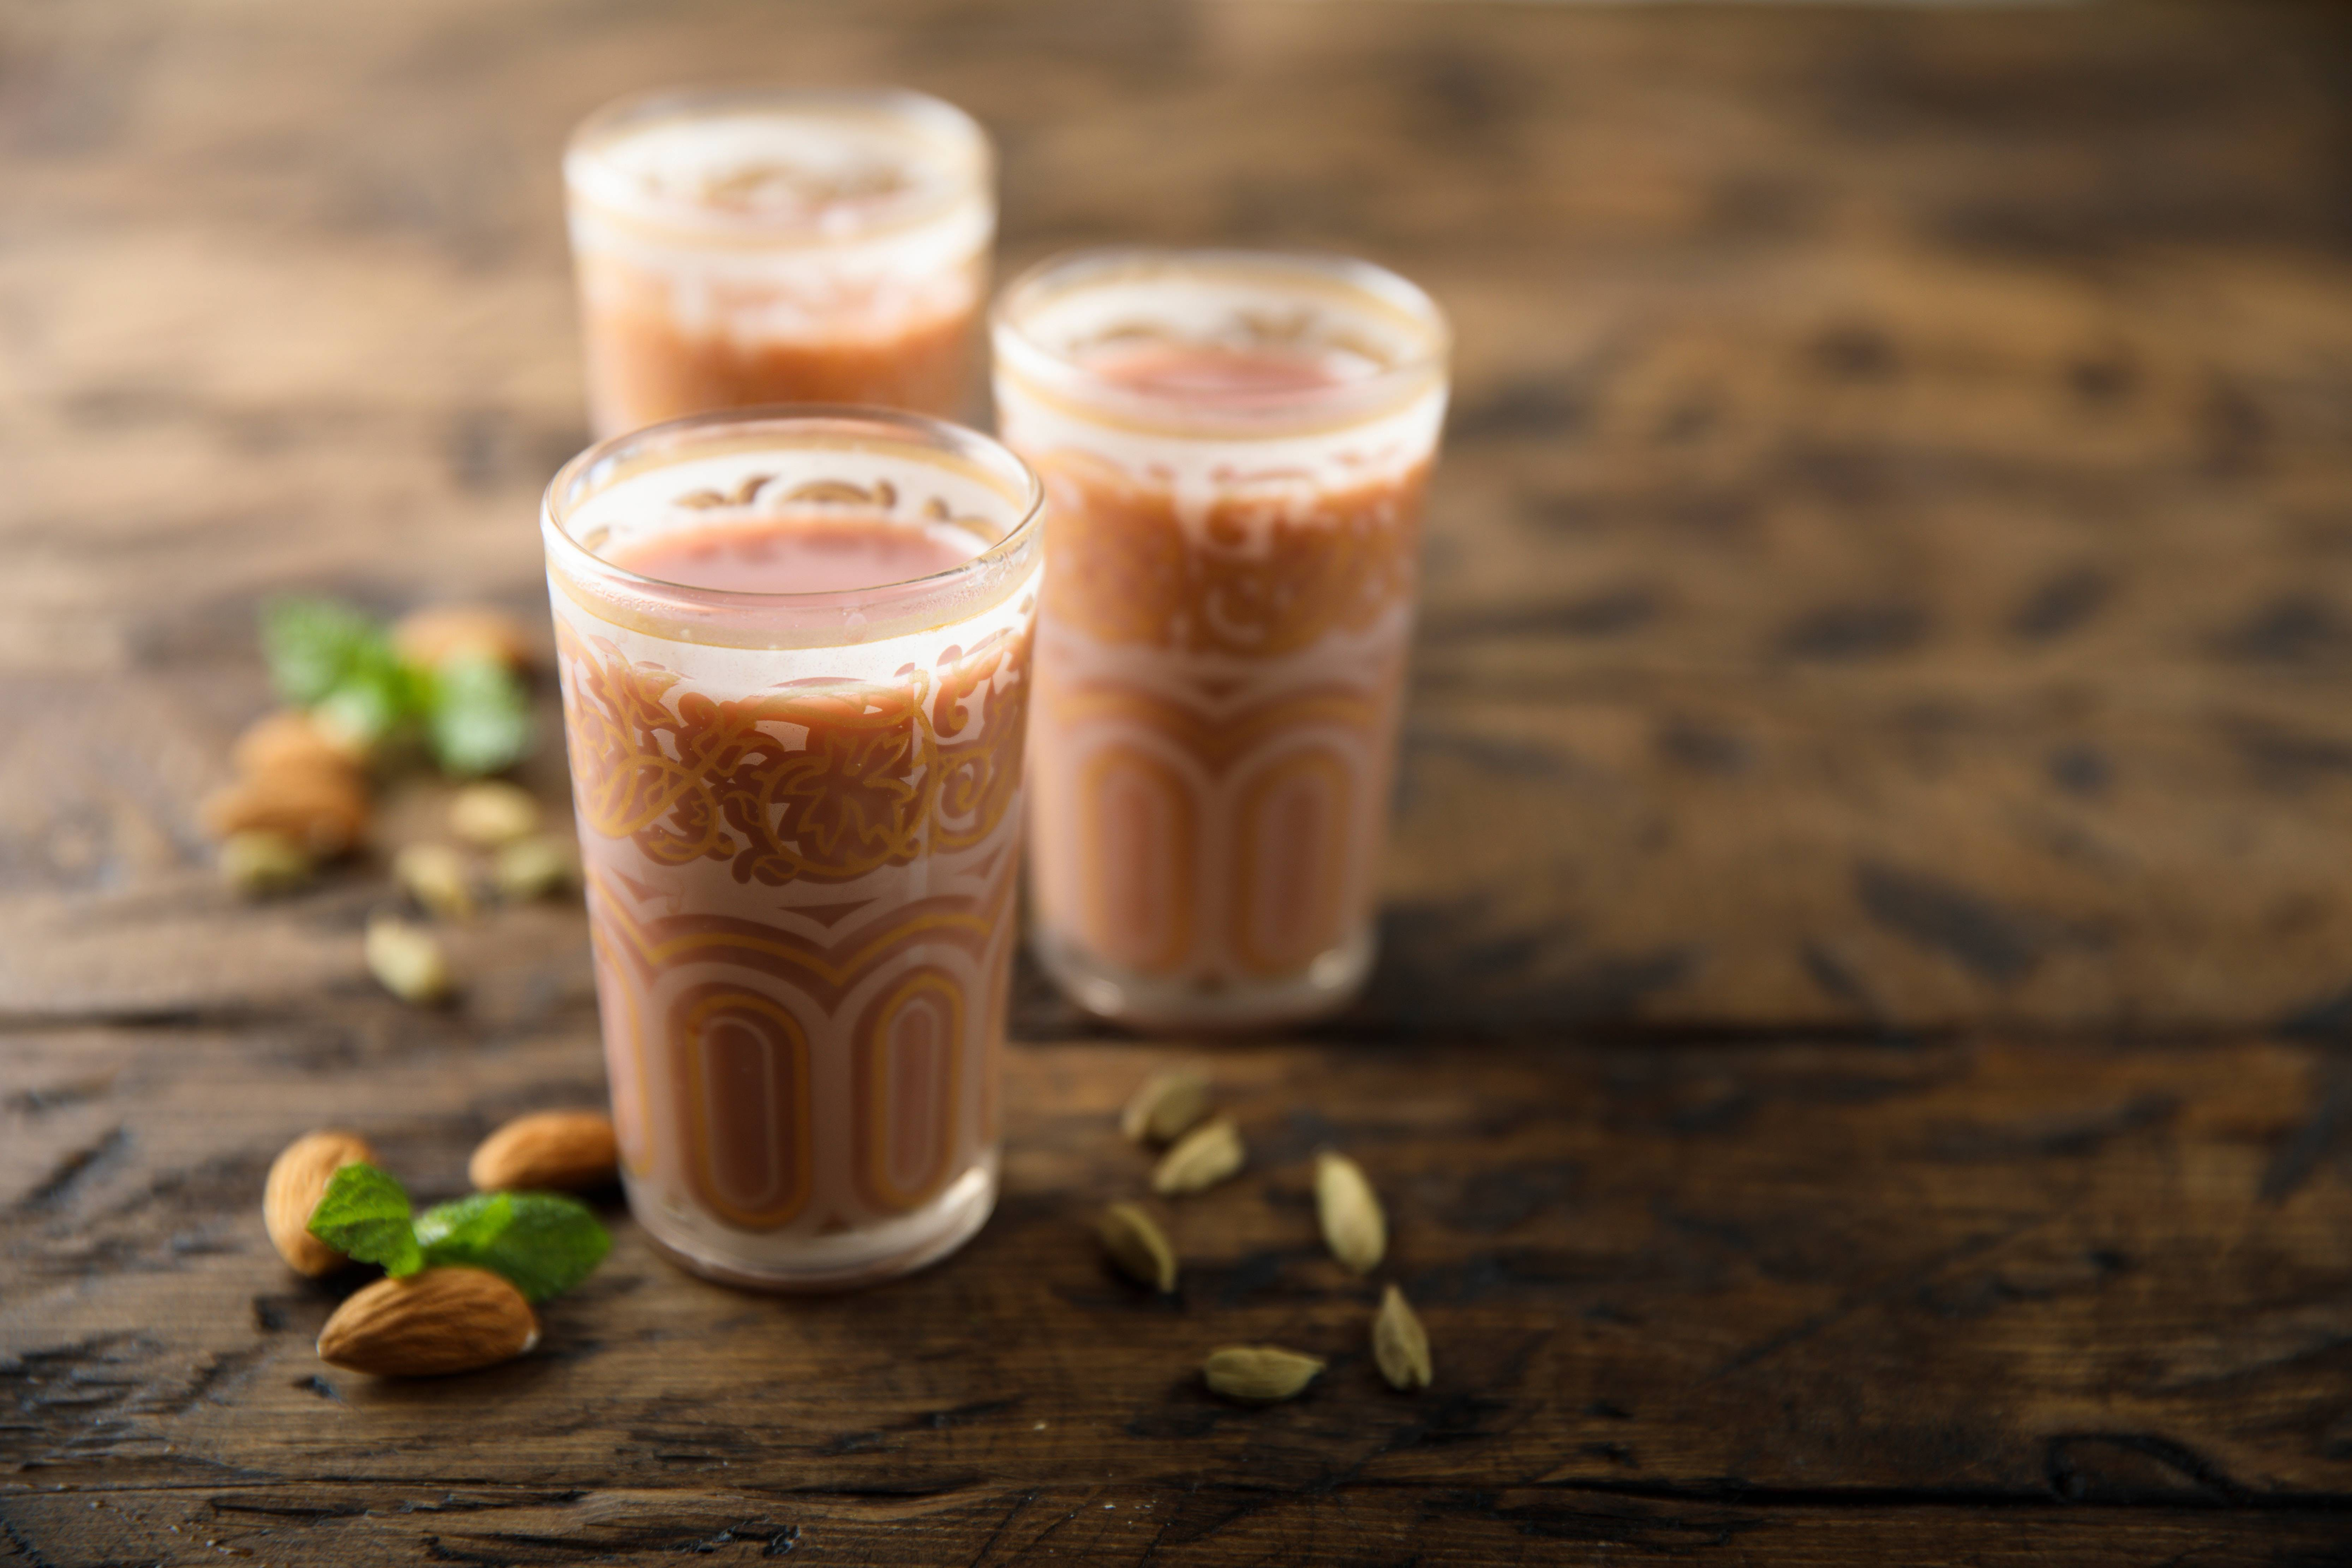 KASHMIRI CHAI OR PINK TEA IS FAMOUS DELICACY OF KASHMIR